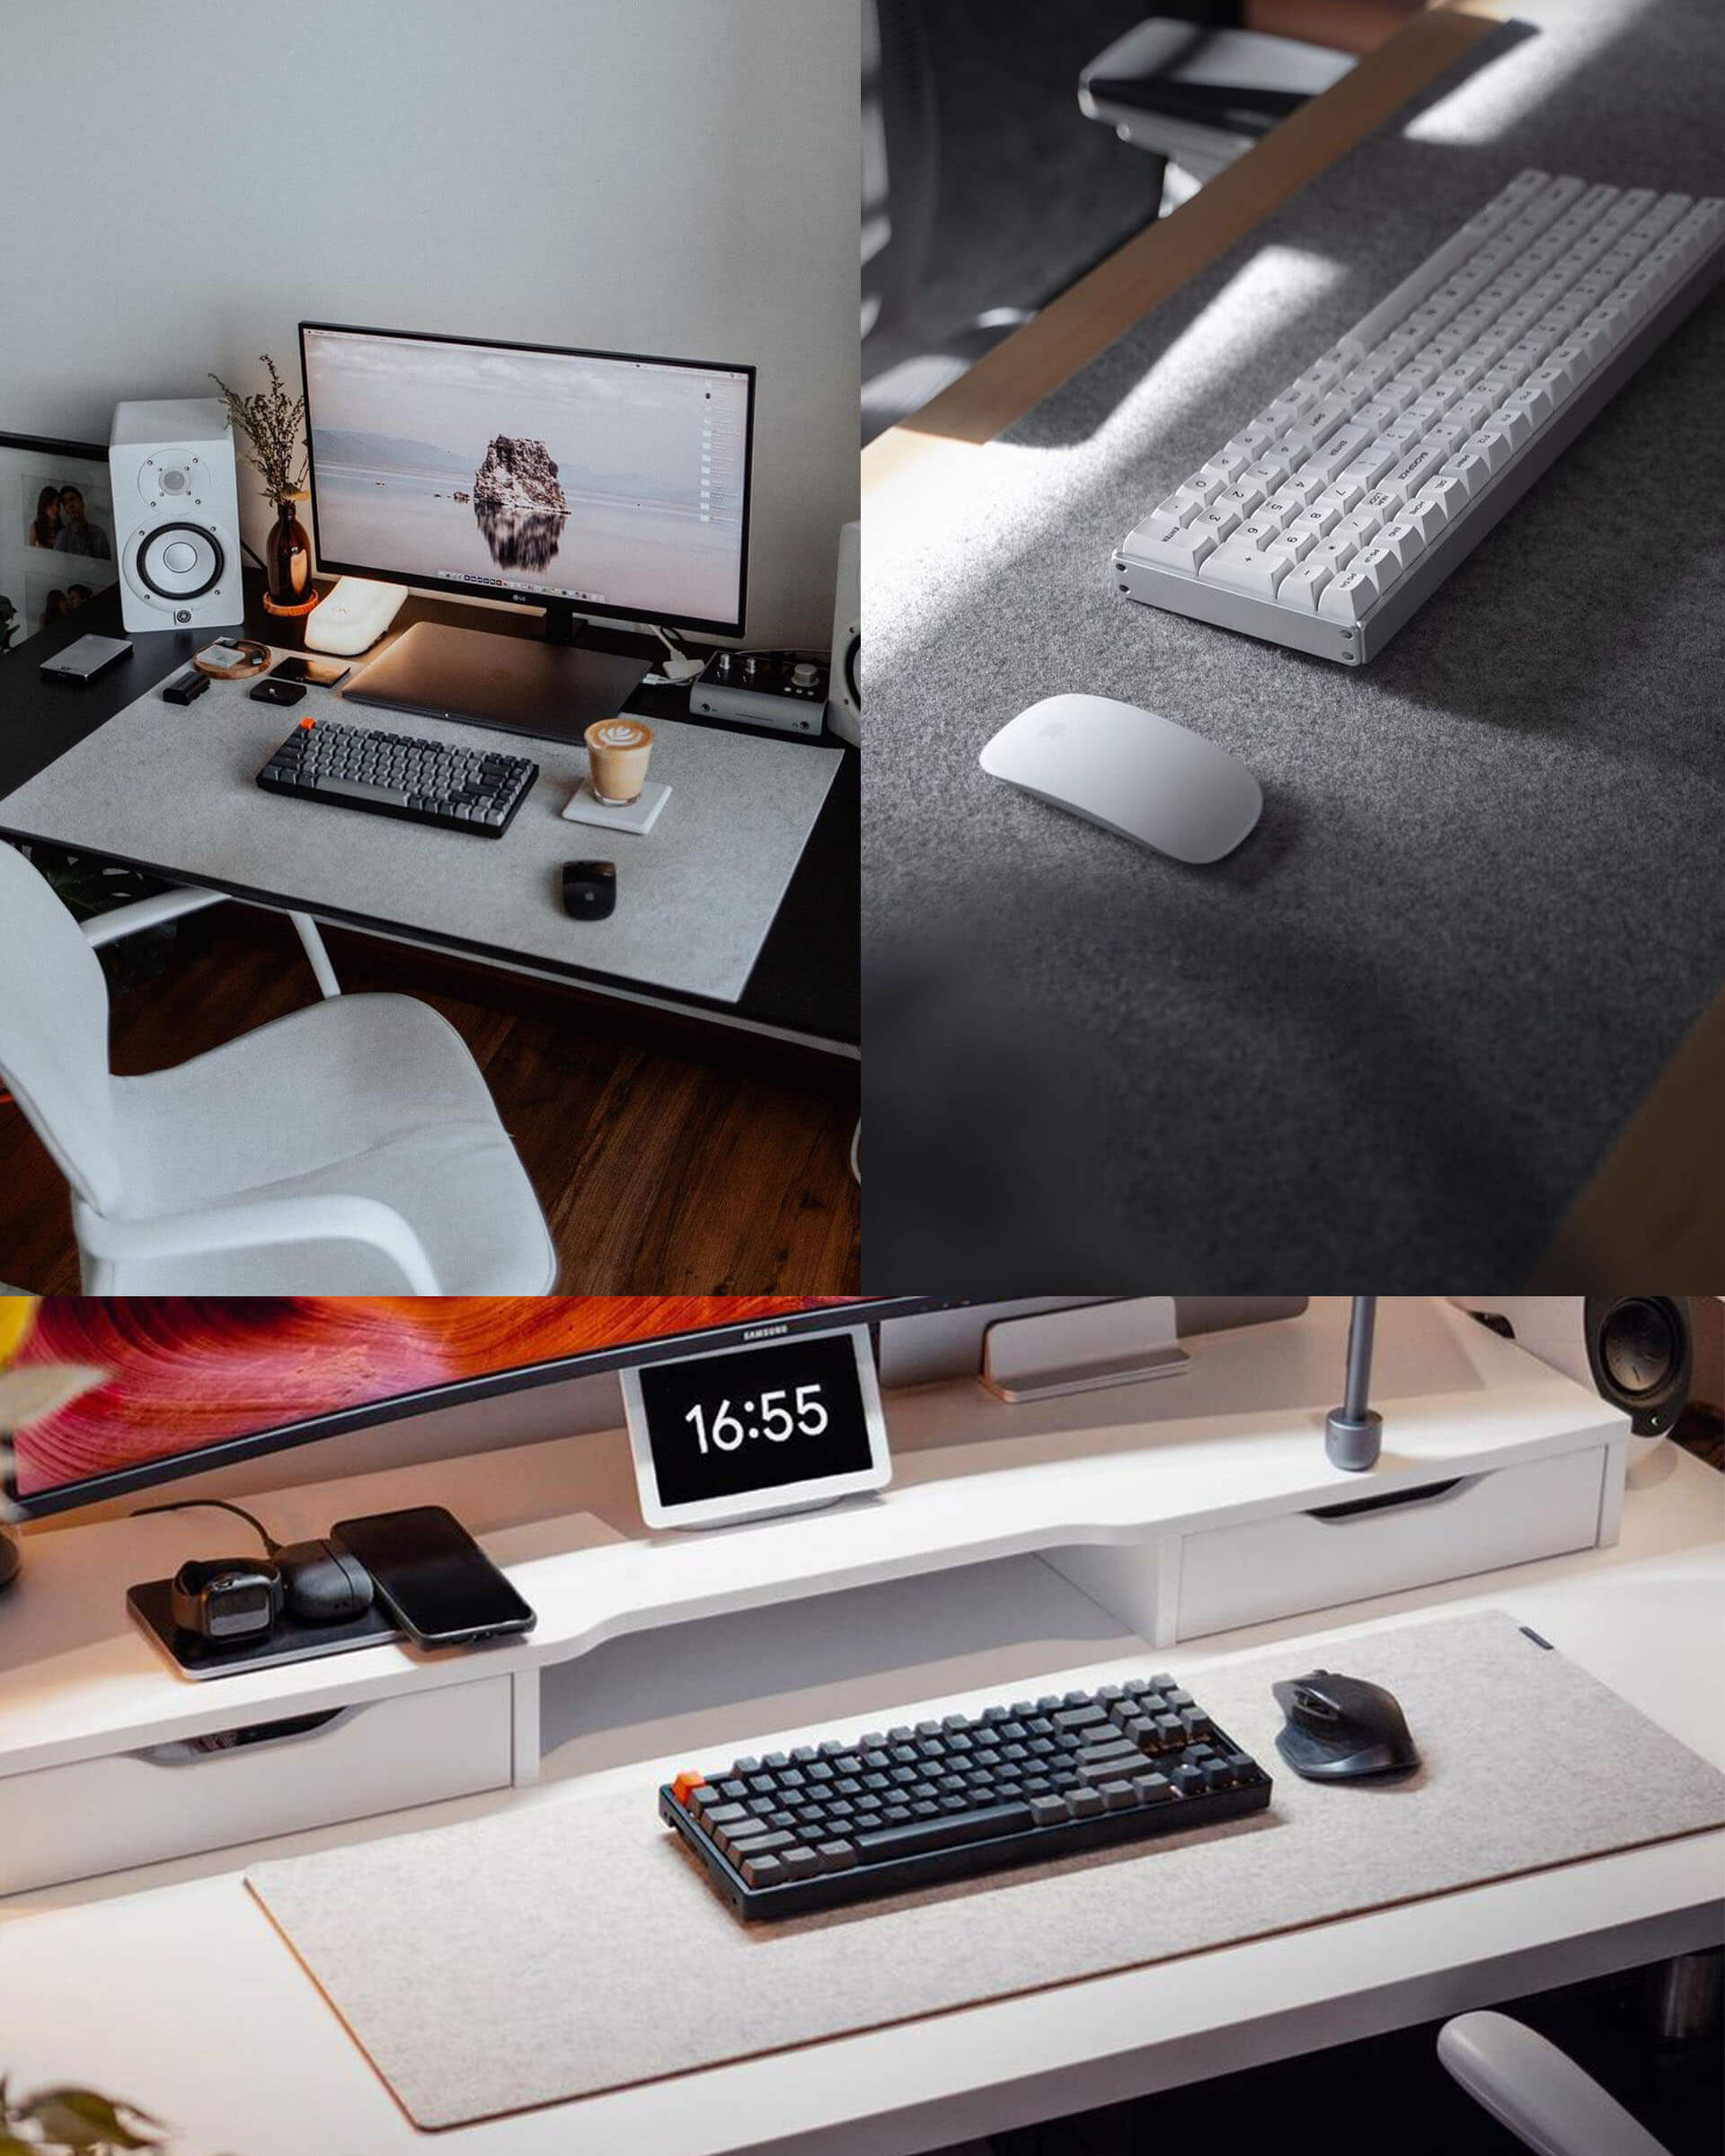 Felt Desk Pad - Fabric Tabletop Cover